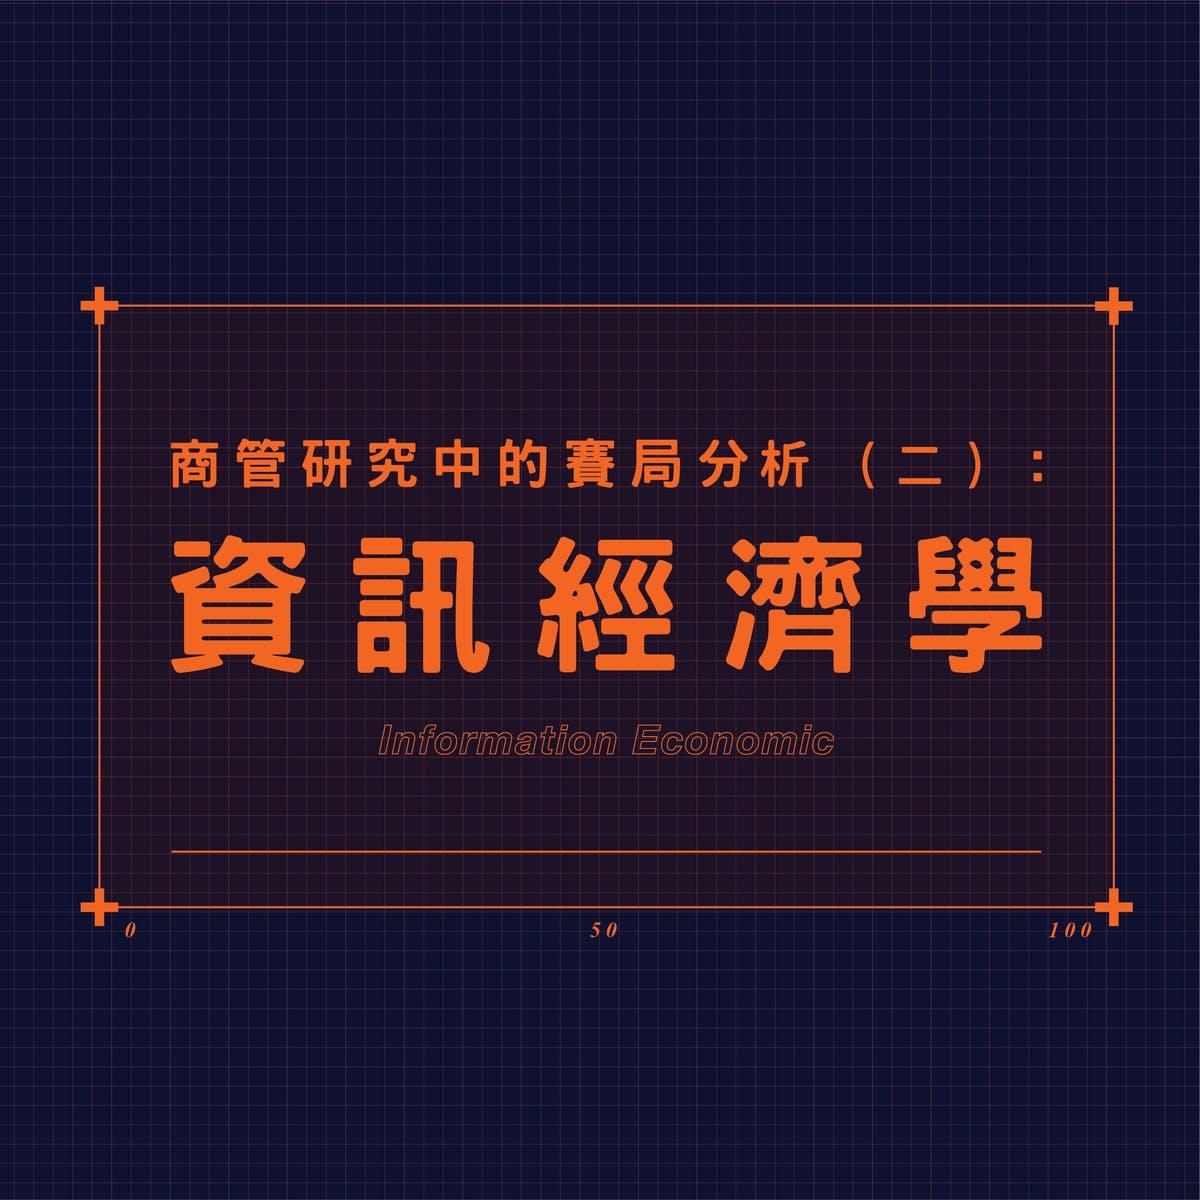 商管研究中的賽局分析(二):資訊經濟學 (Game Theoretic Analysis for Business Research (2))